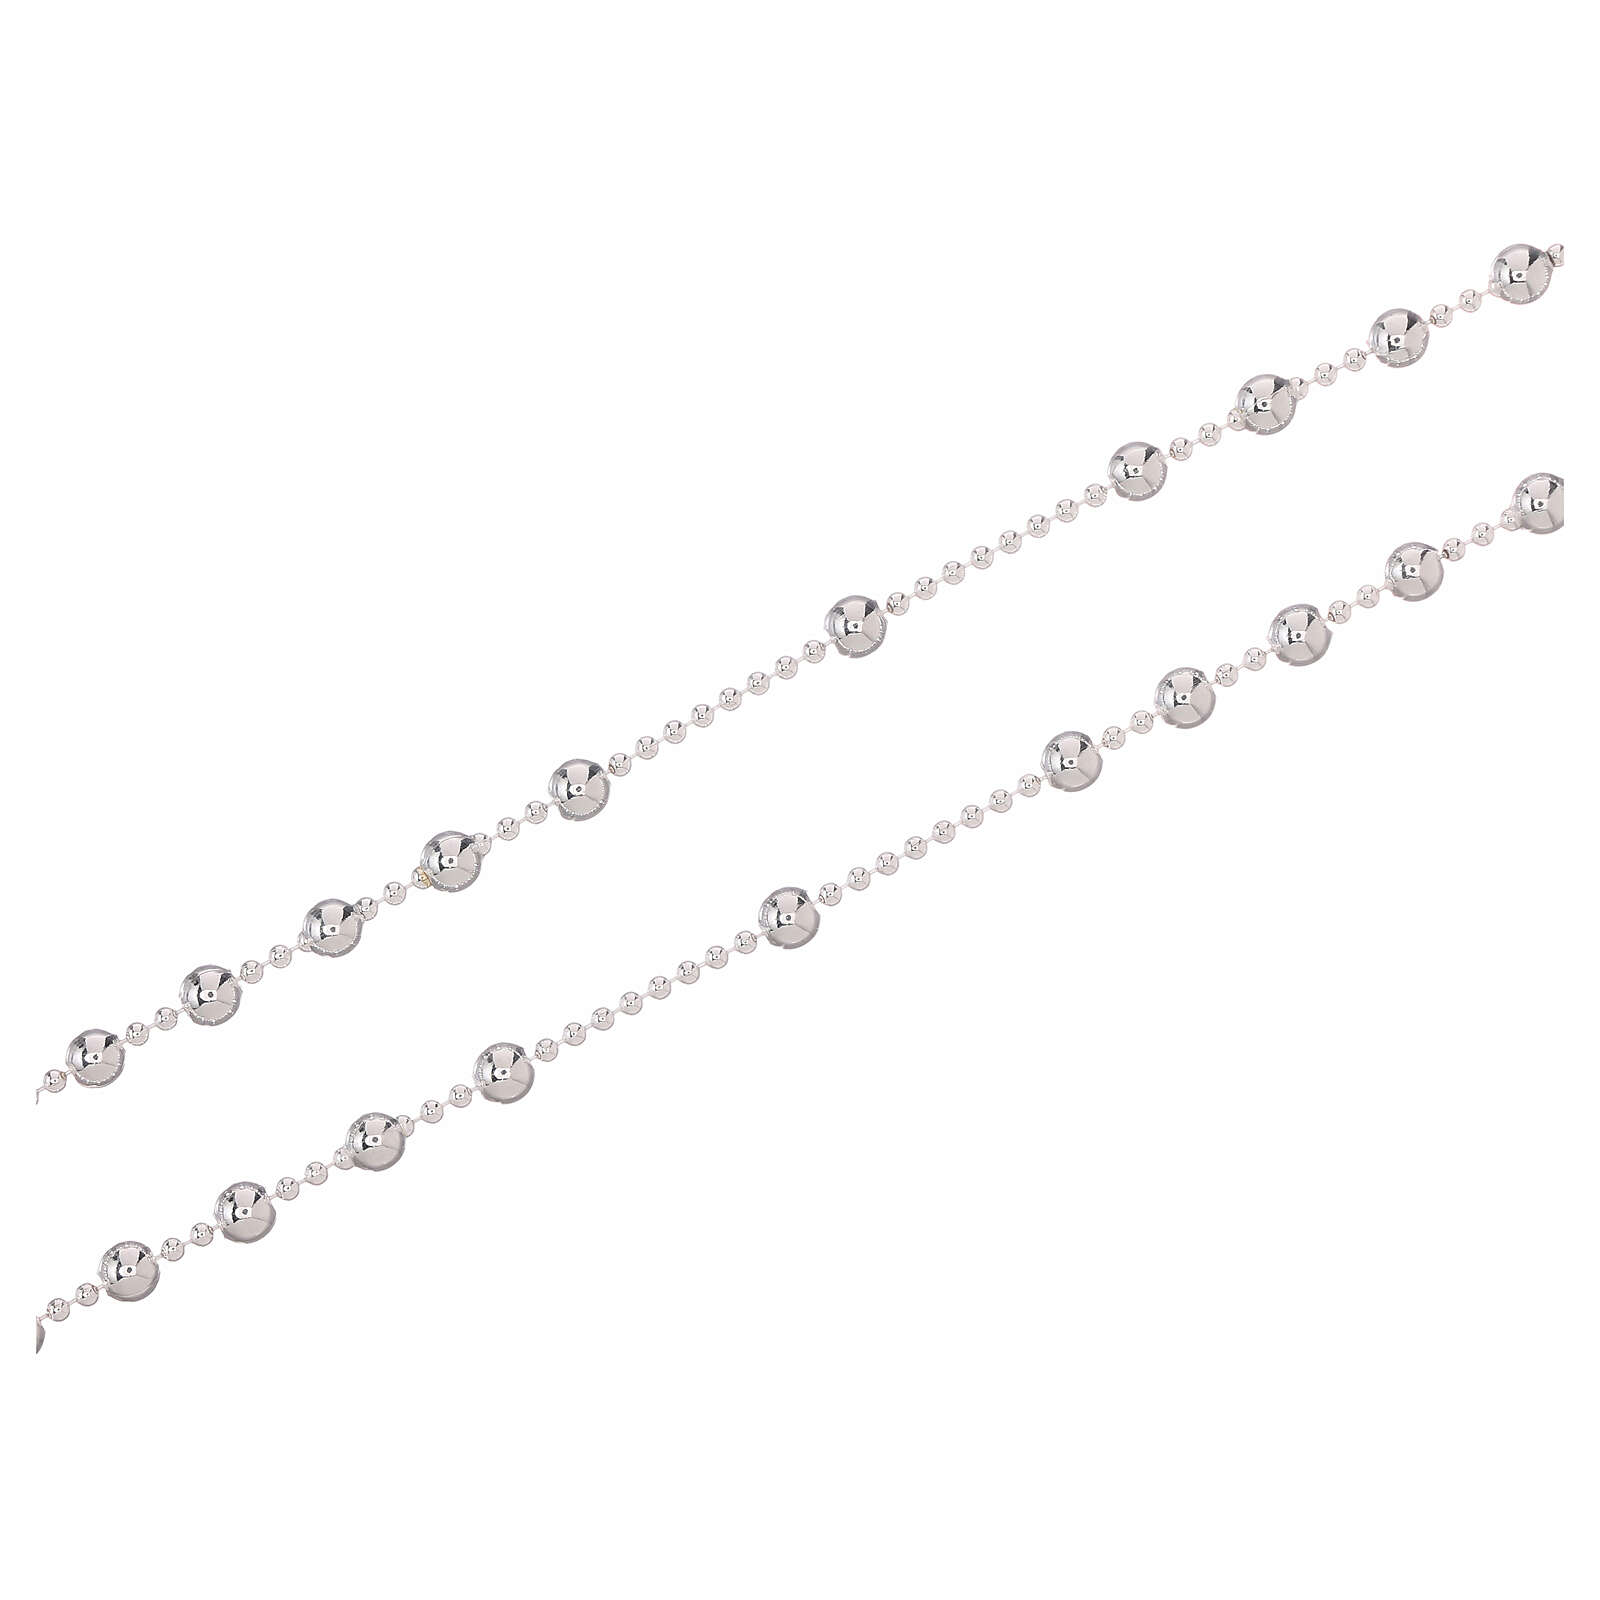 STOCK Rosario collar plata 925 granos 3 mm 4